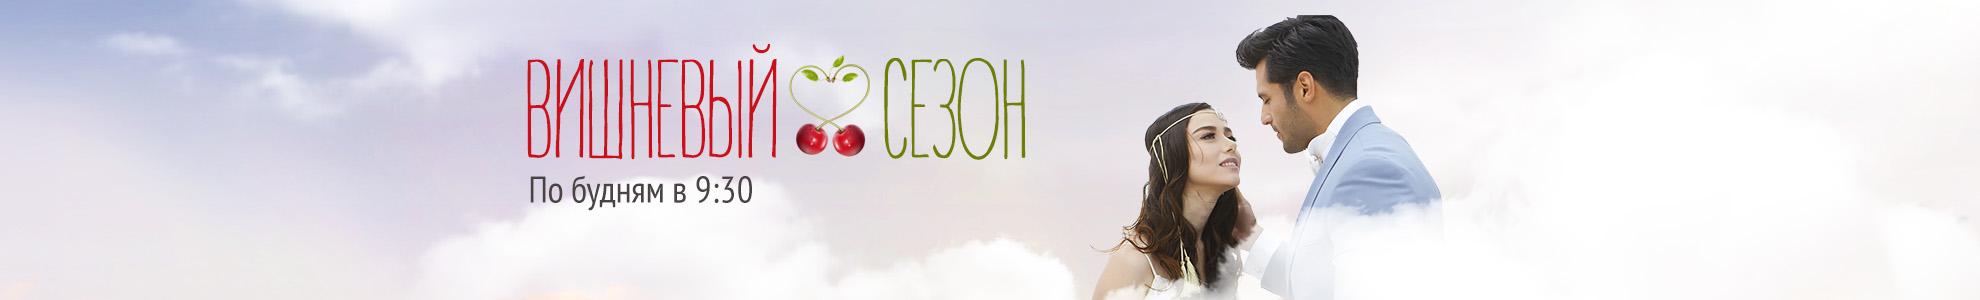 vishnevyo-sezon-banner